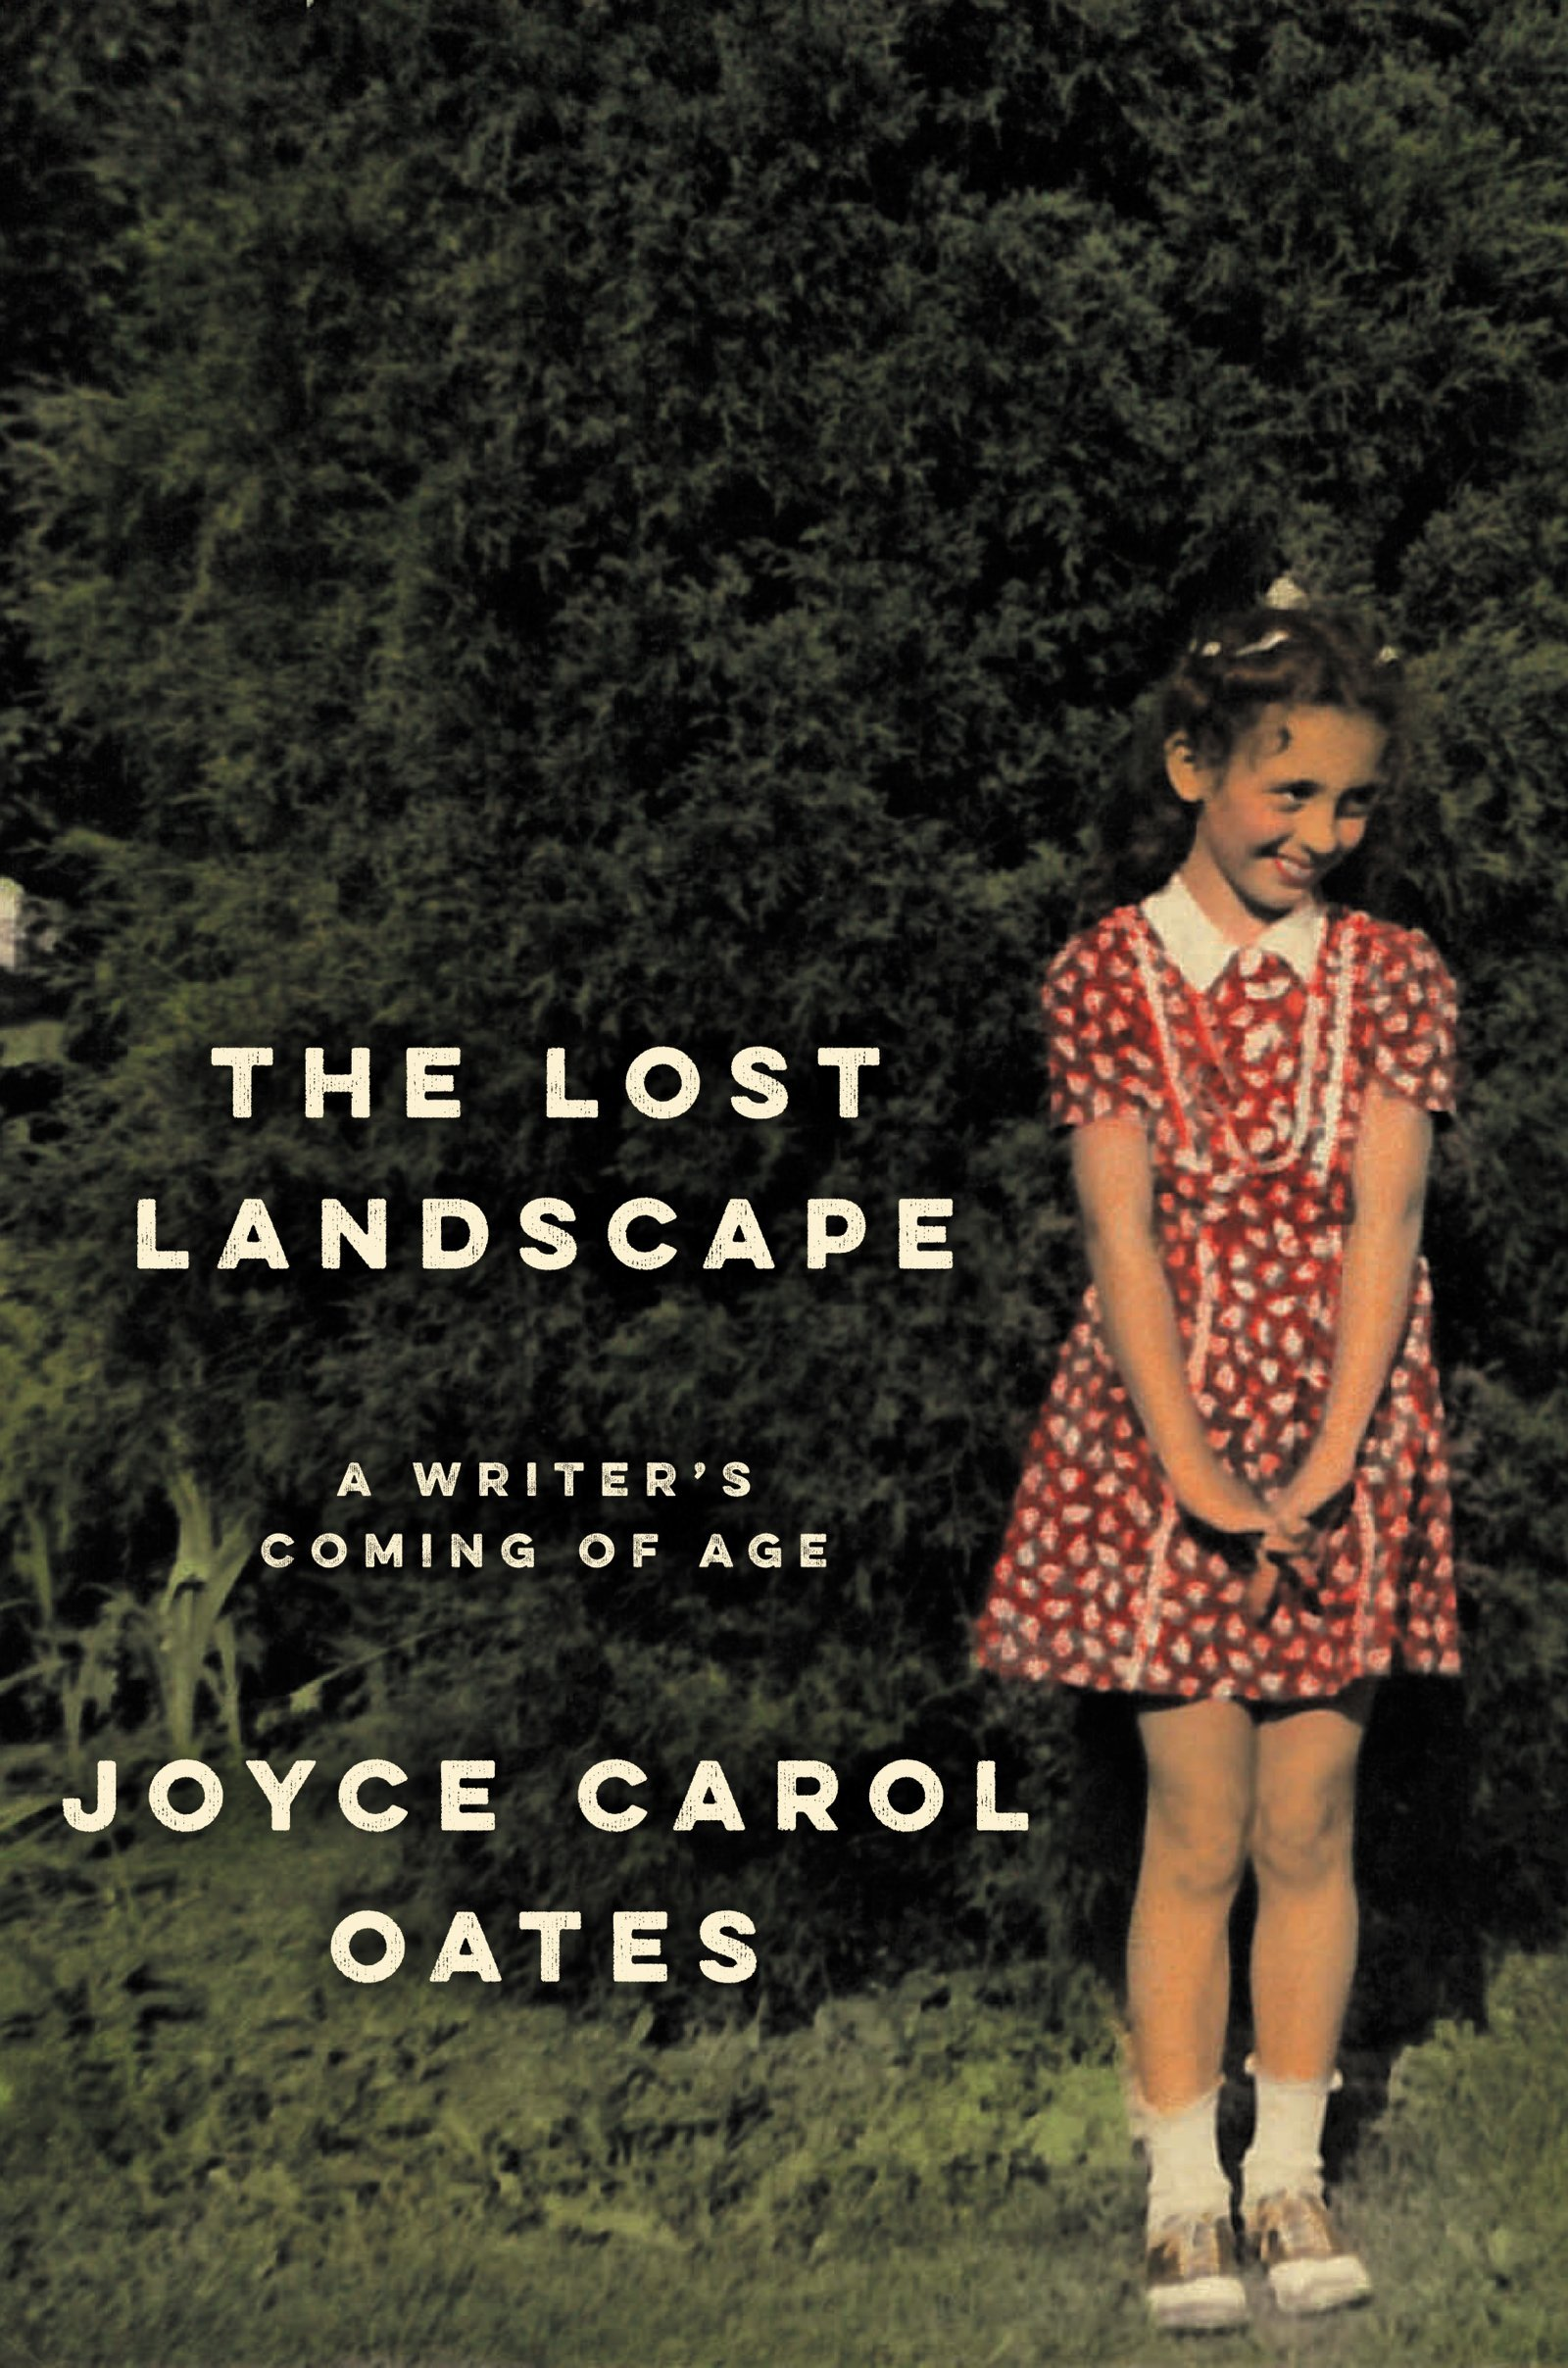 the lost landscape by joyce carol oates out sept 8 29